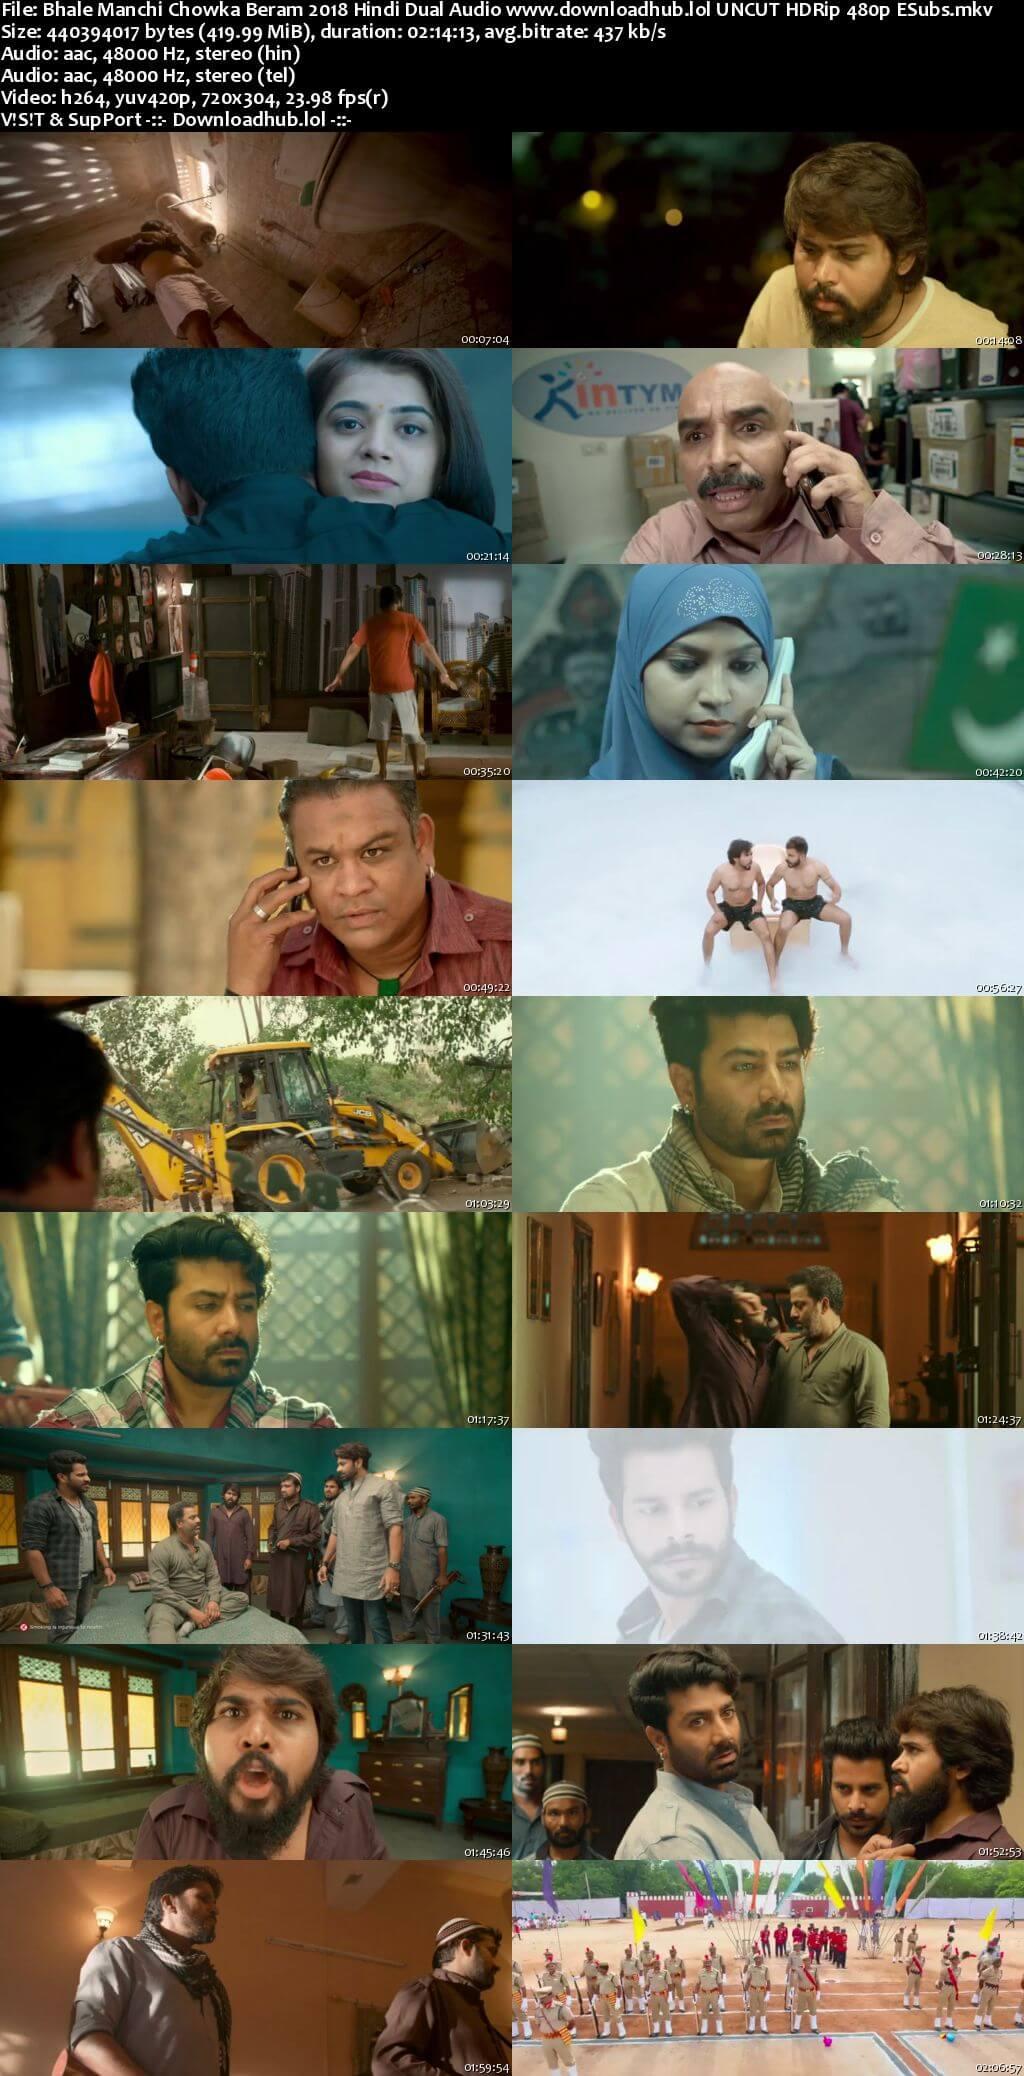 Bhale Manchi Chowka Beram 2018 Hindi Dual Audio 400MB UNCUT HDRip 480p ESubs